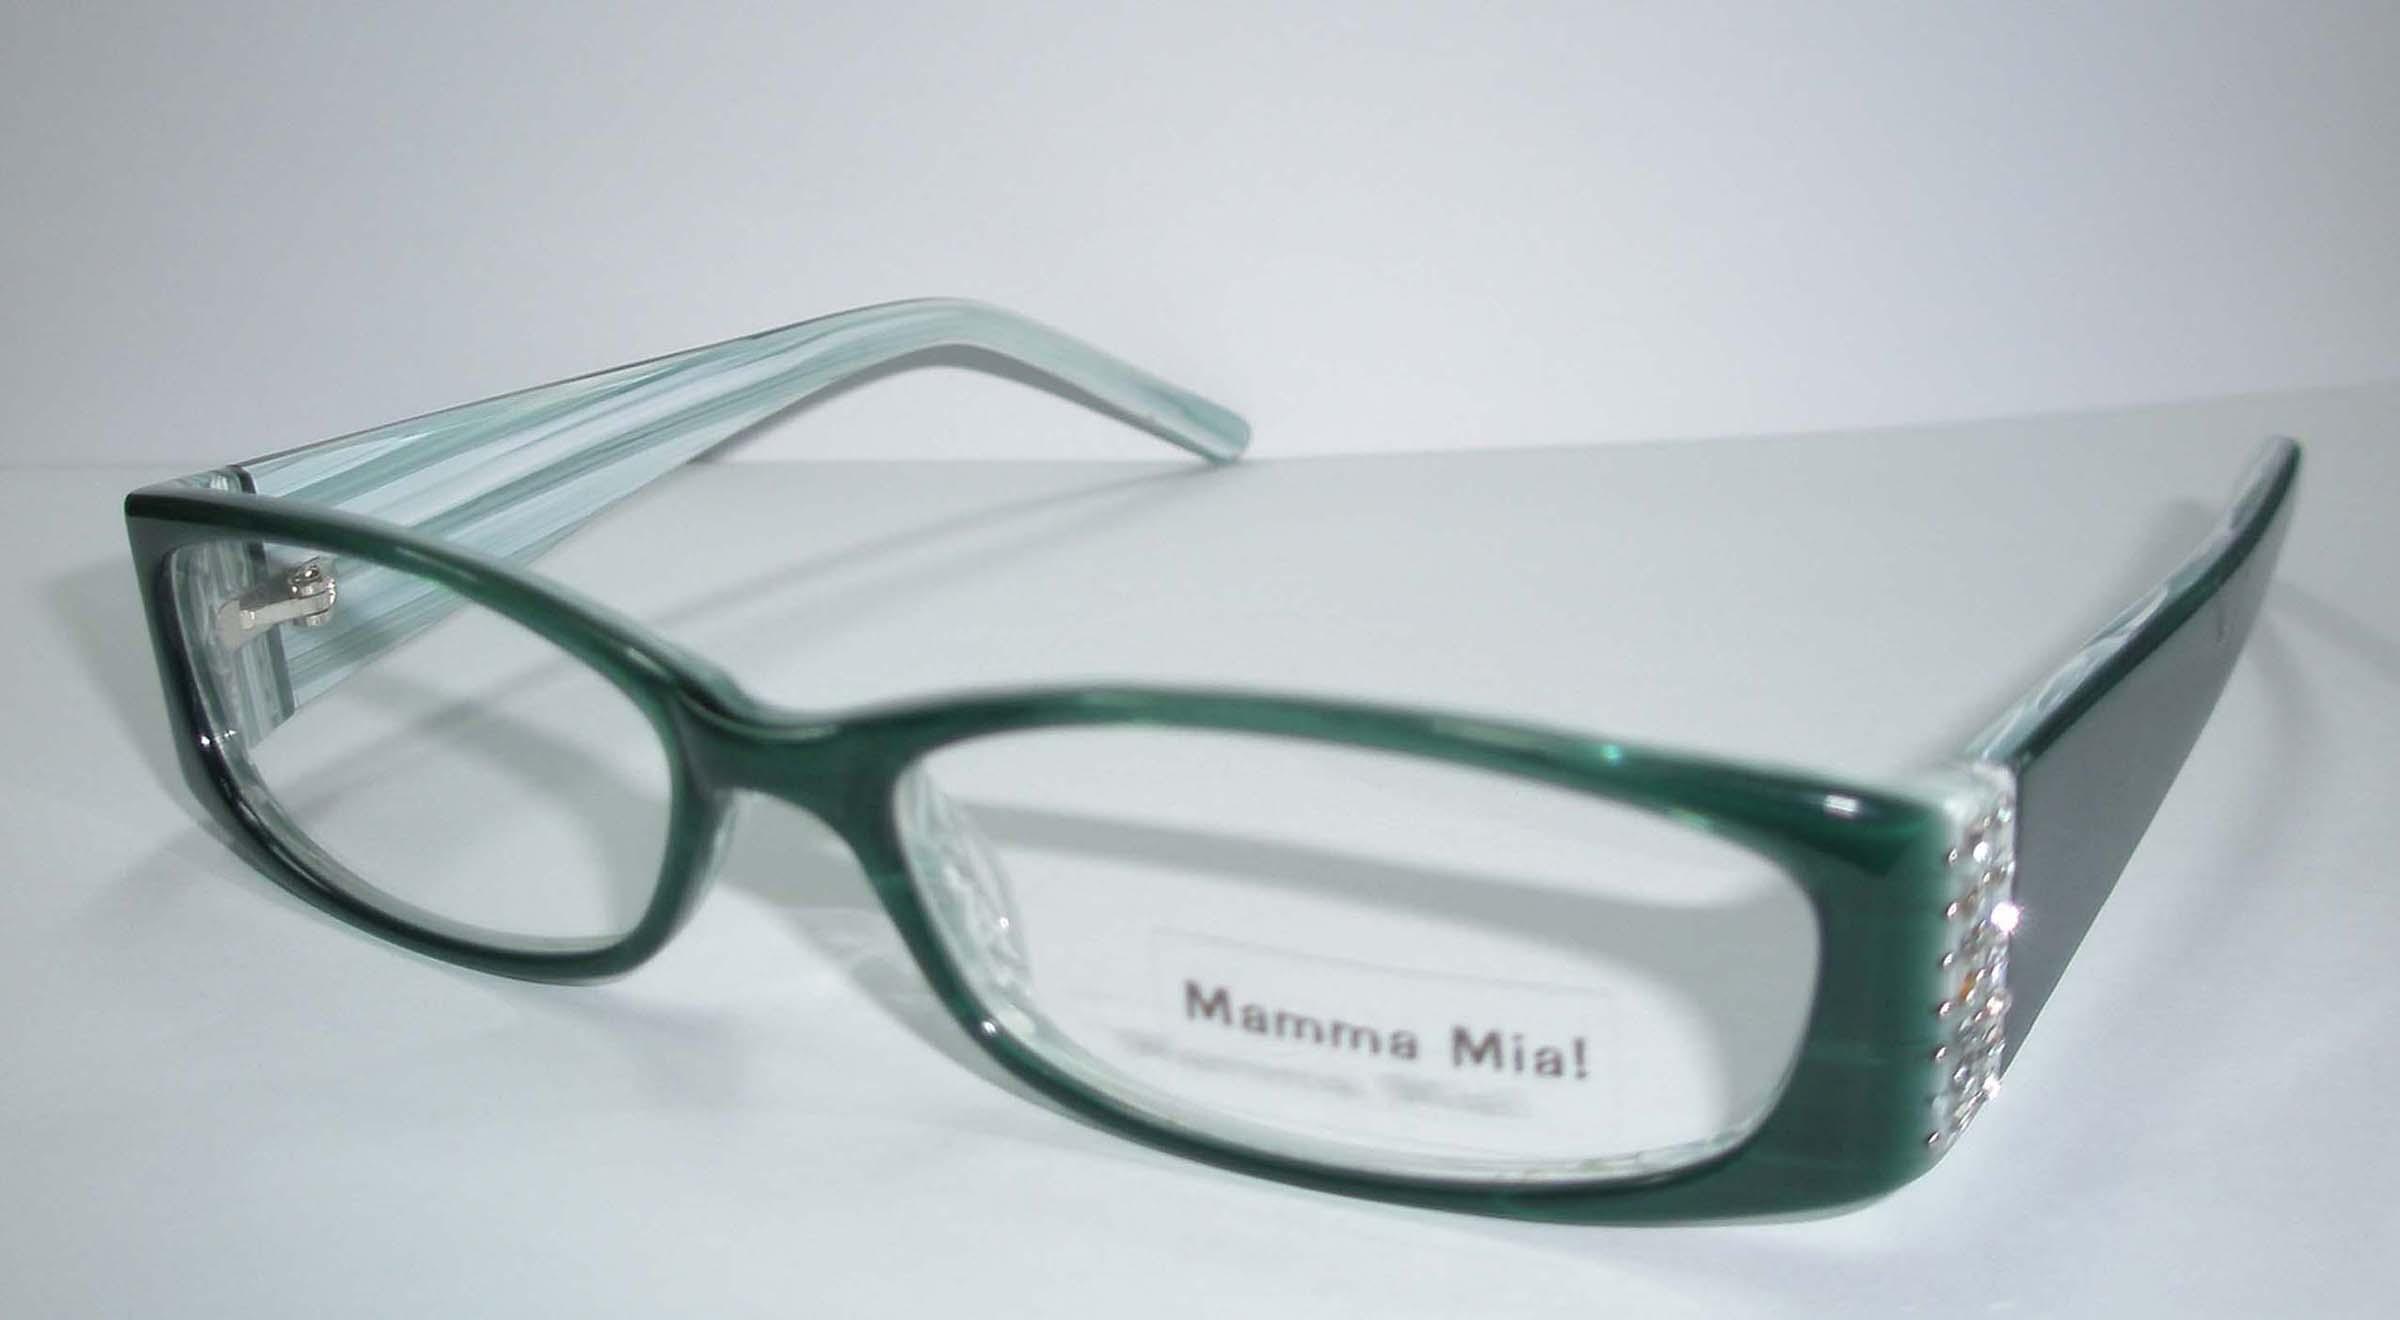 Chanel Eyeglasses, Eyewear, Optical frame, frame